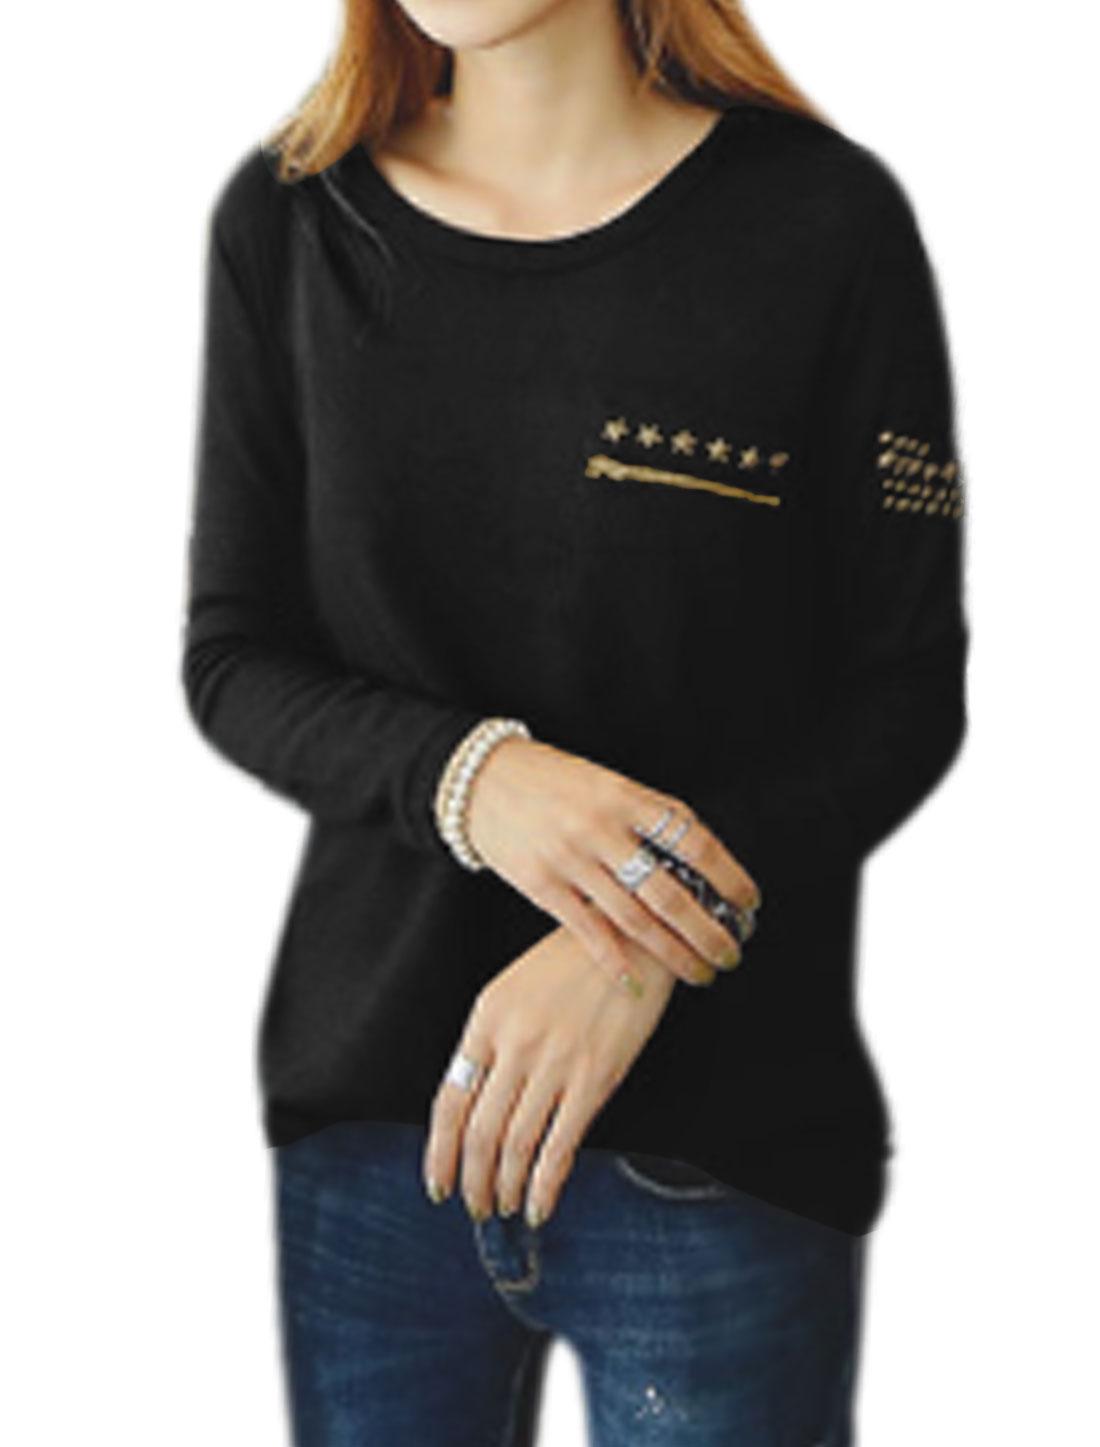 Women Long Sleeves Stars Rivets Embellished High Low Hem Knit Tee Black XS